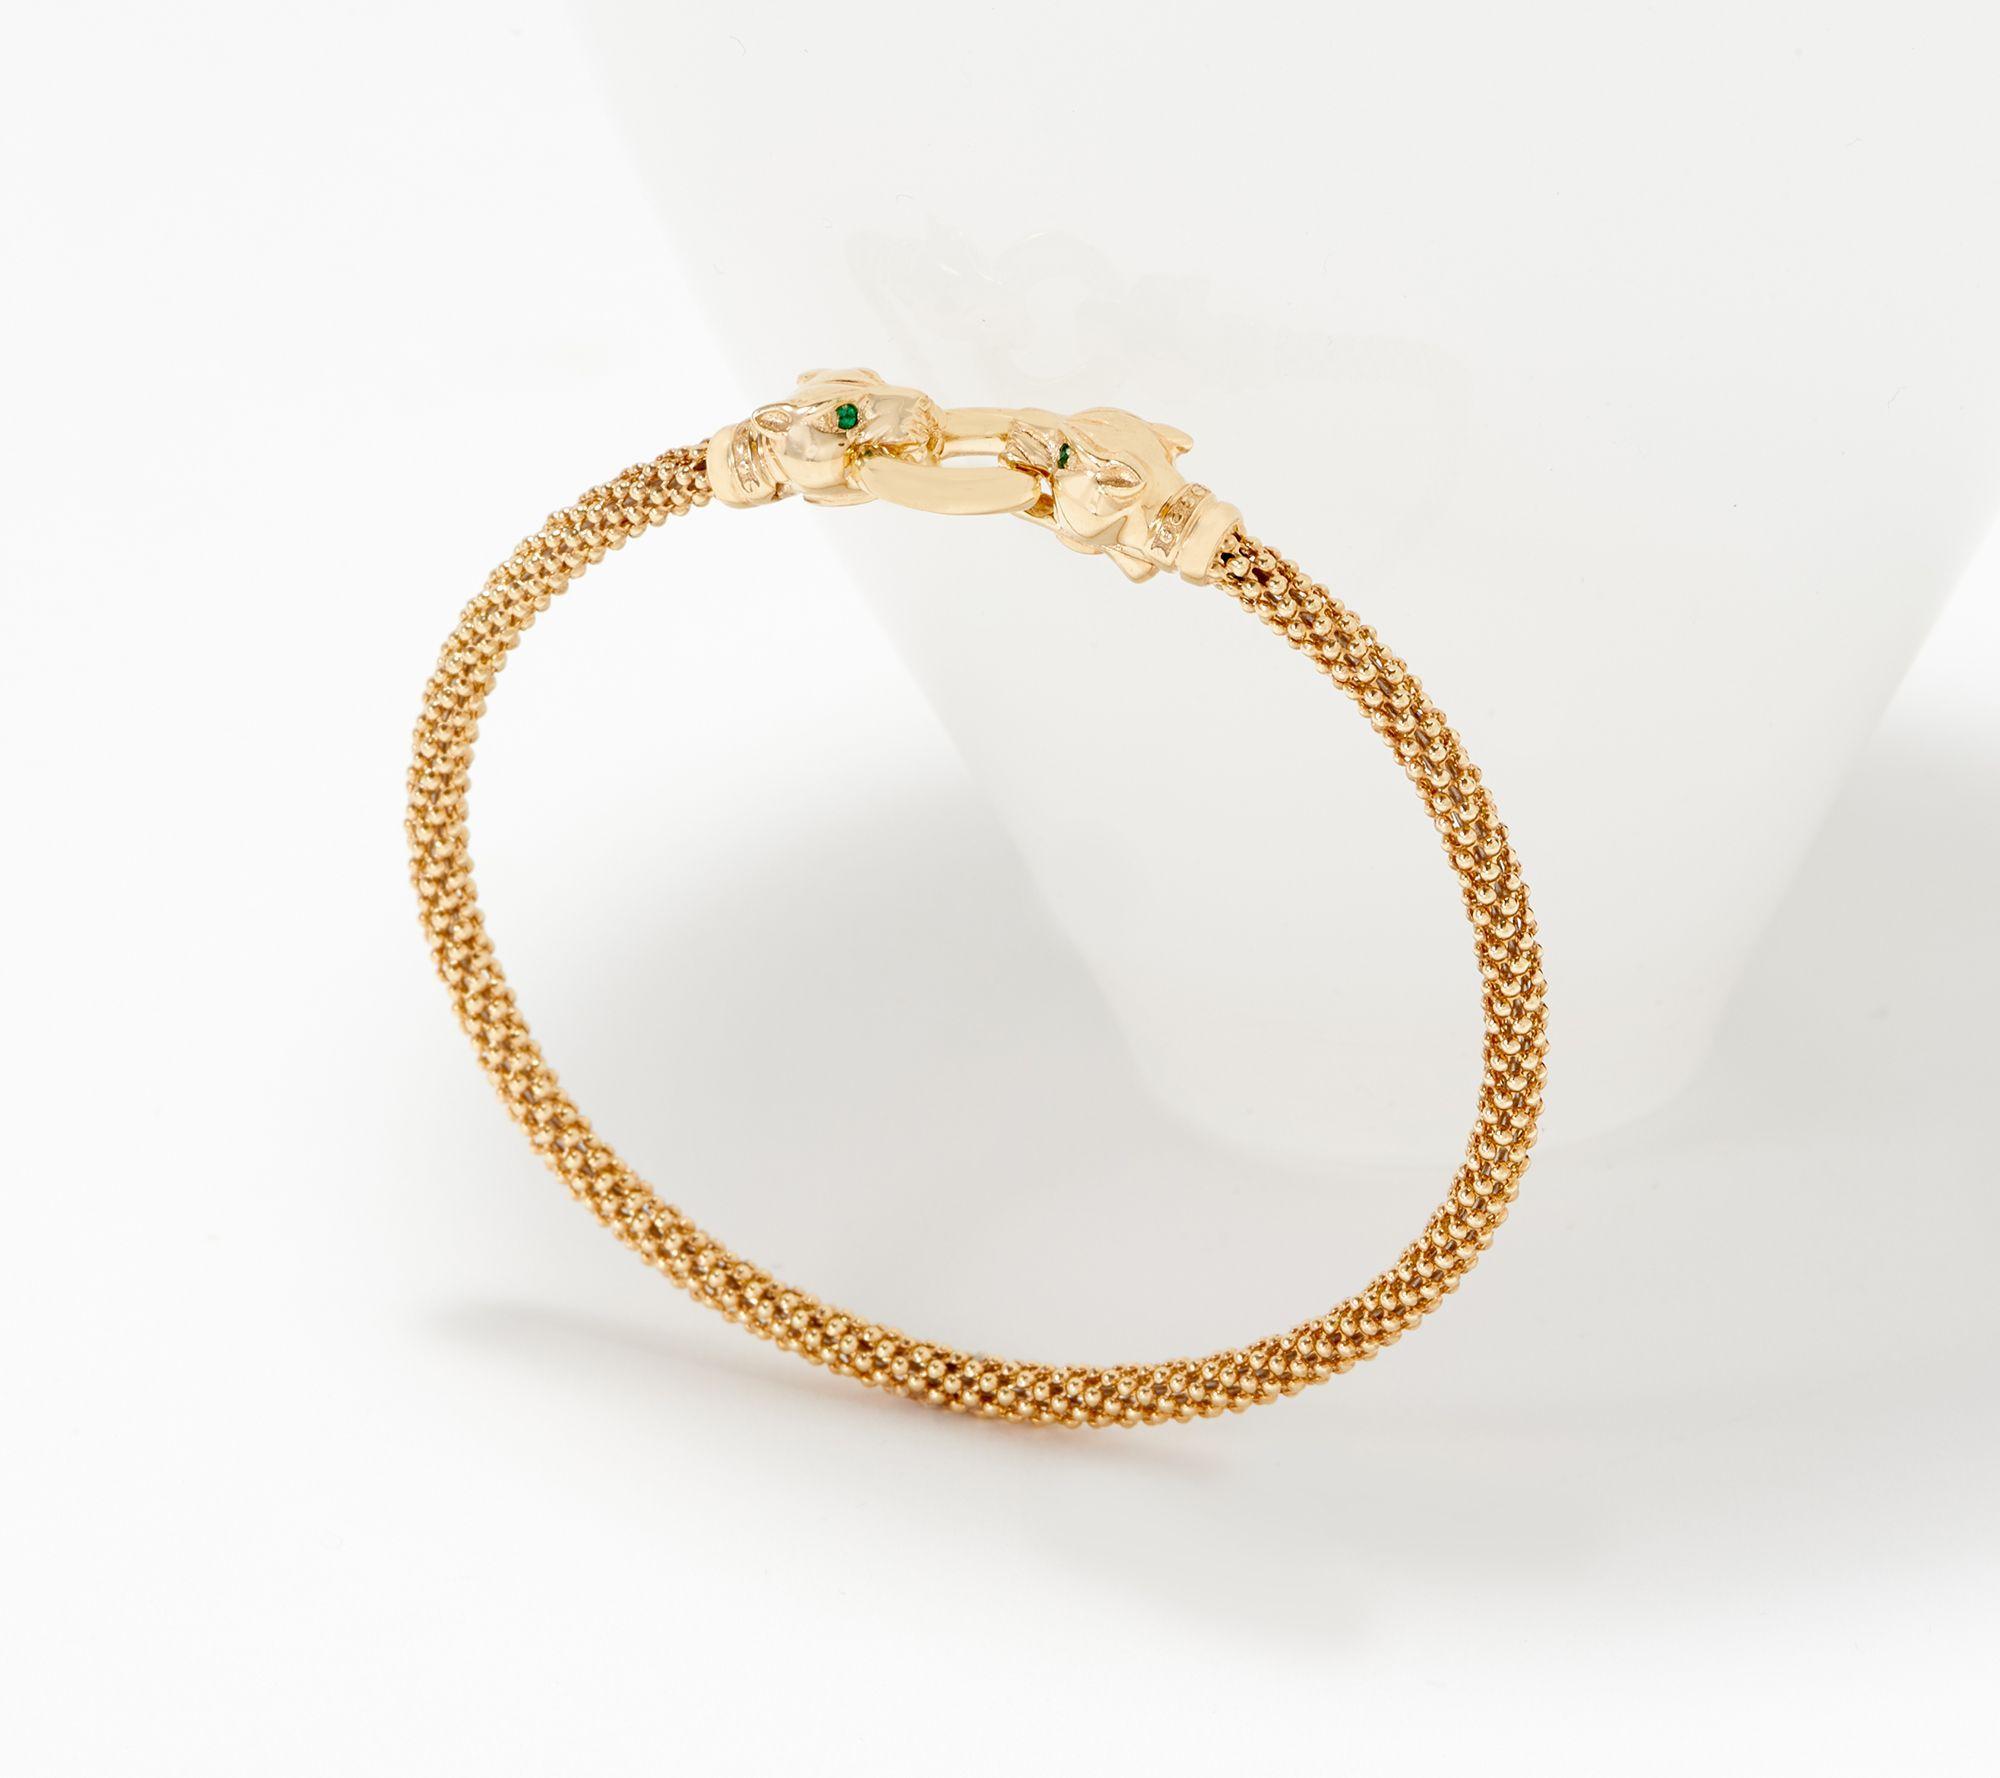 Panther Head Bracelet 14k Gold